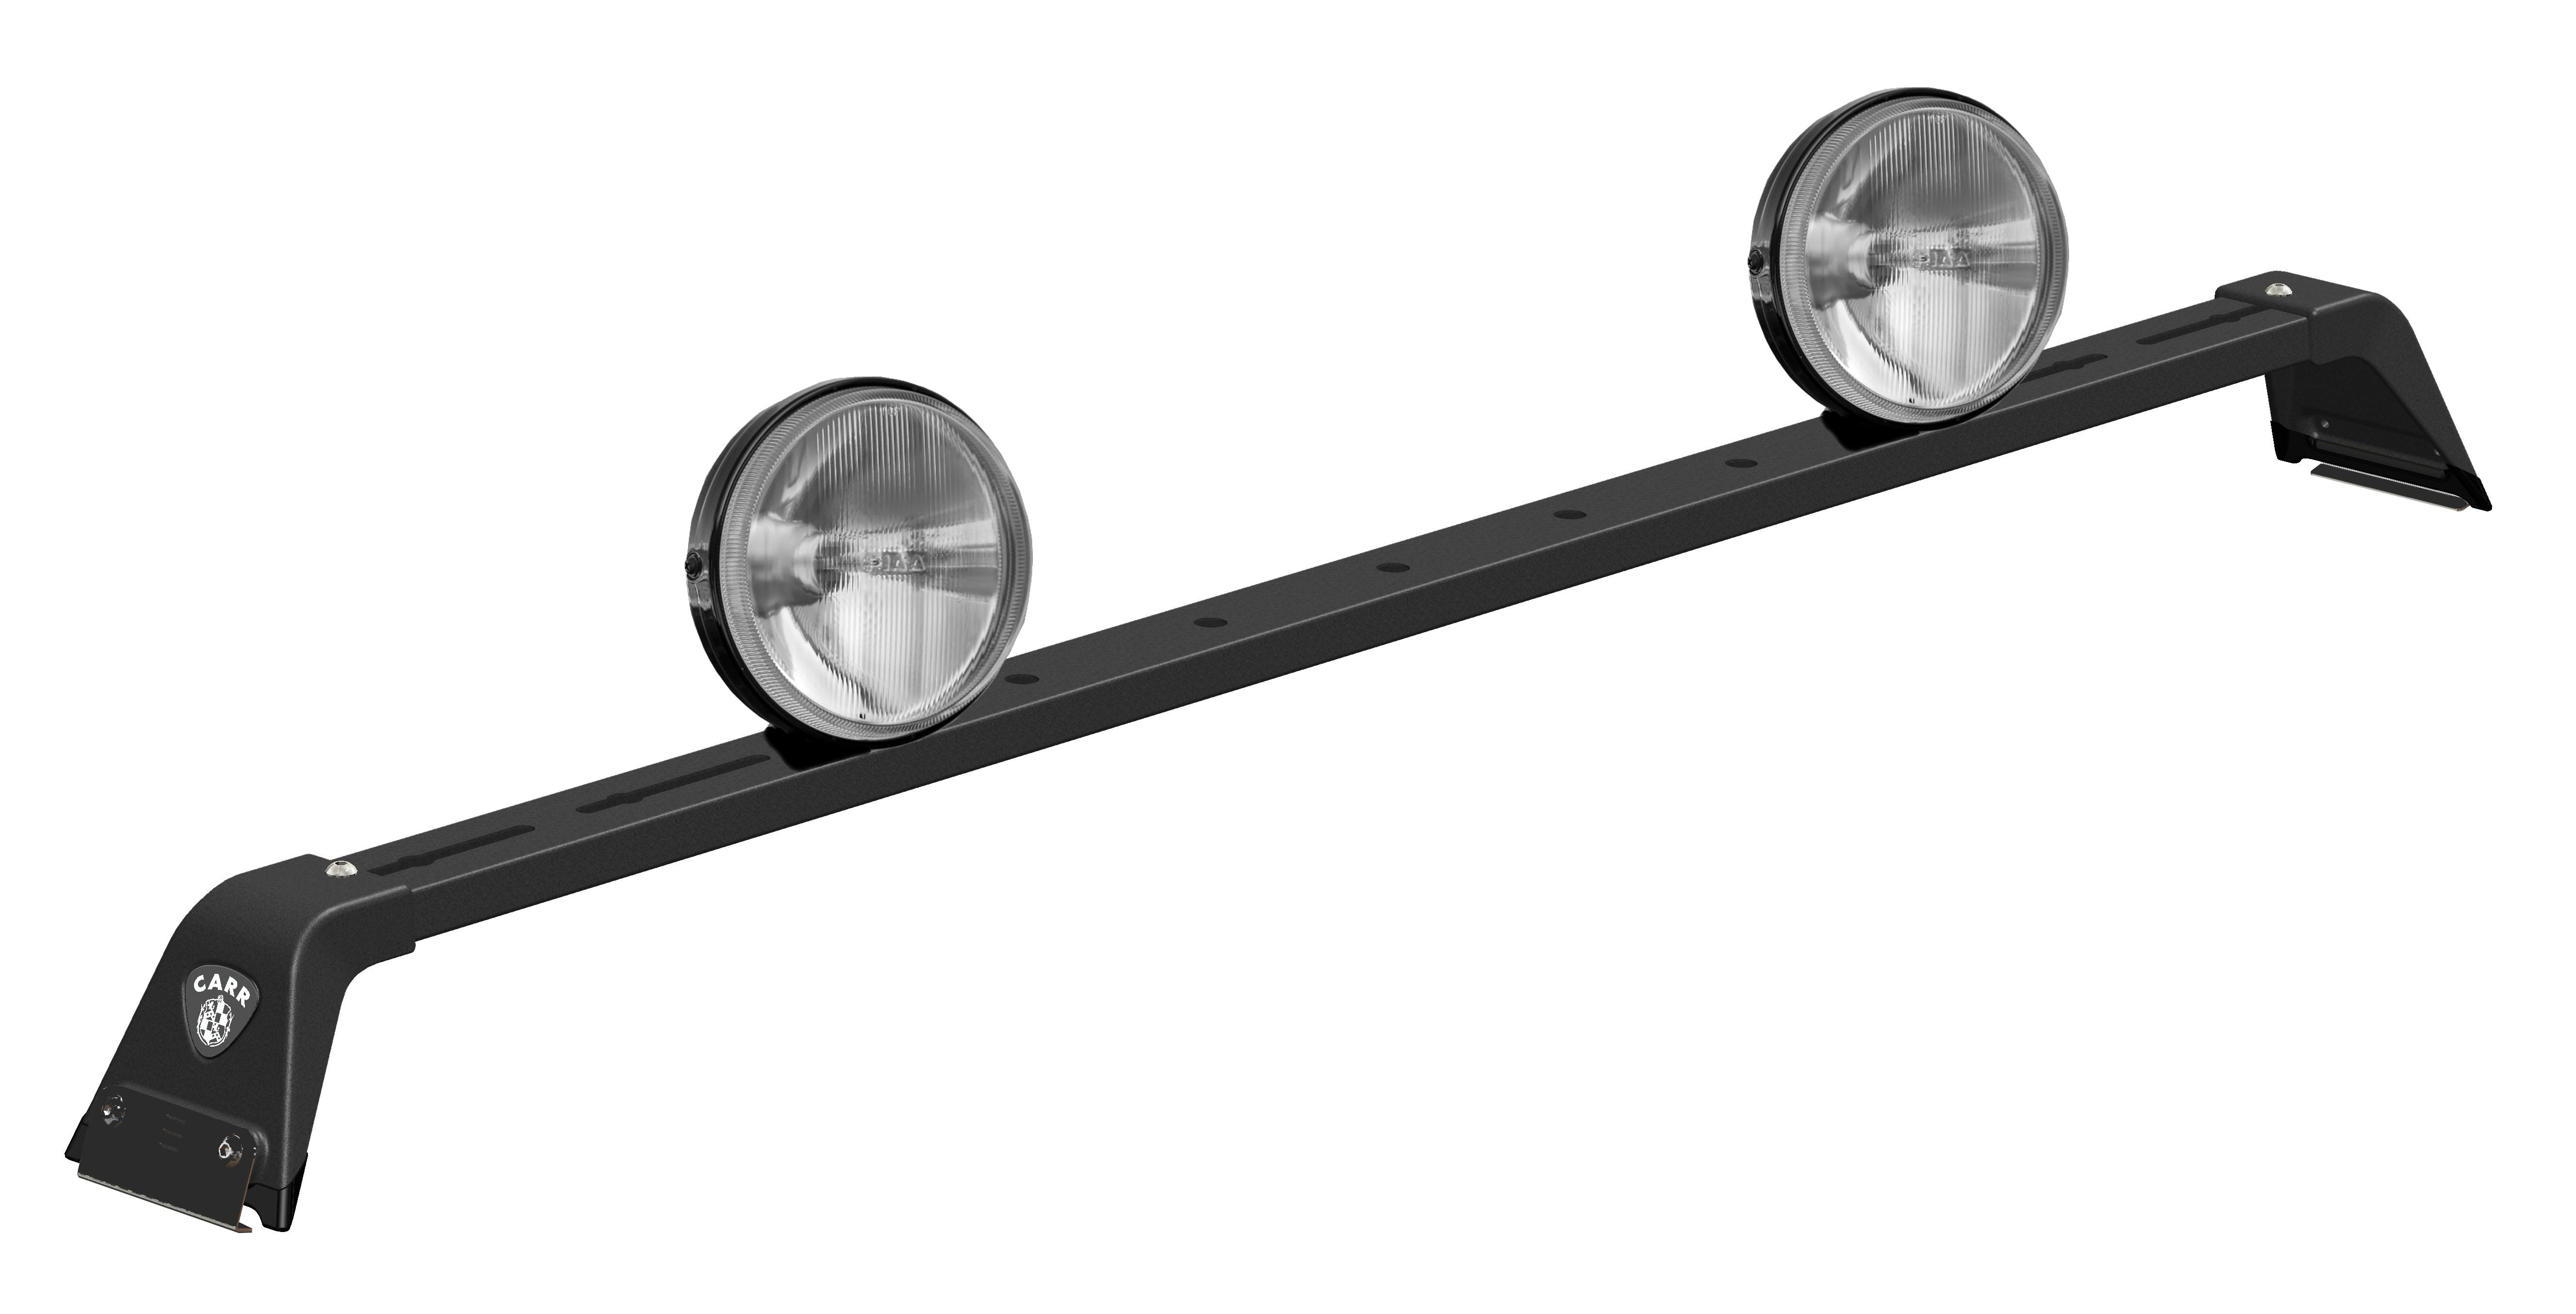 Carr M-Profile Light Bar Blac k Powder Coat